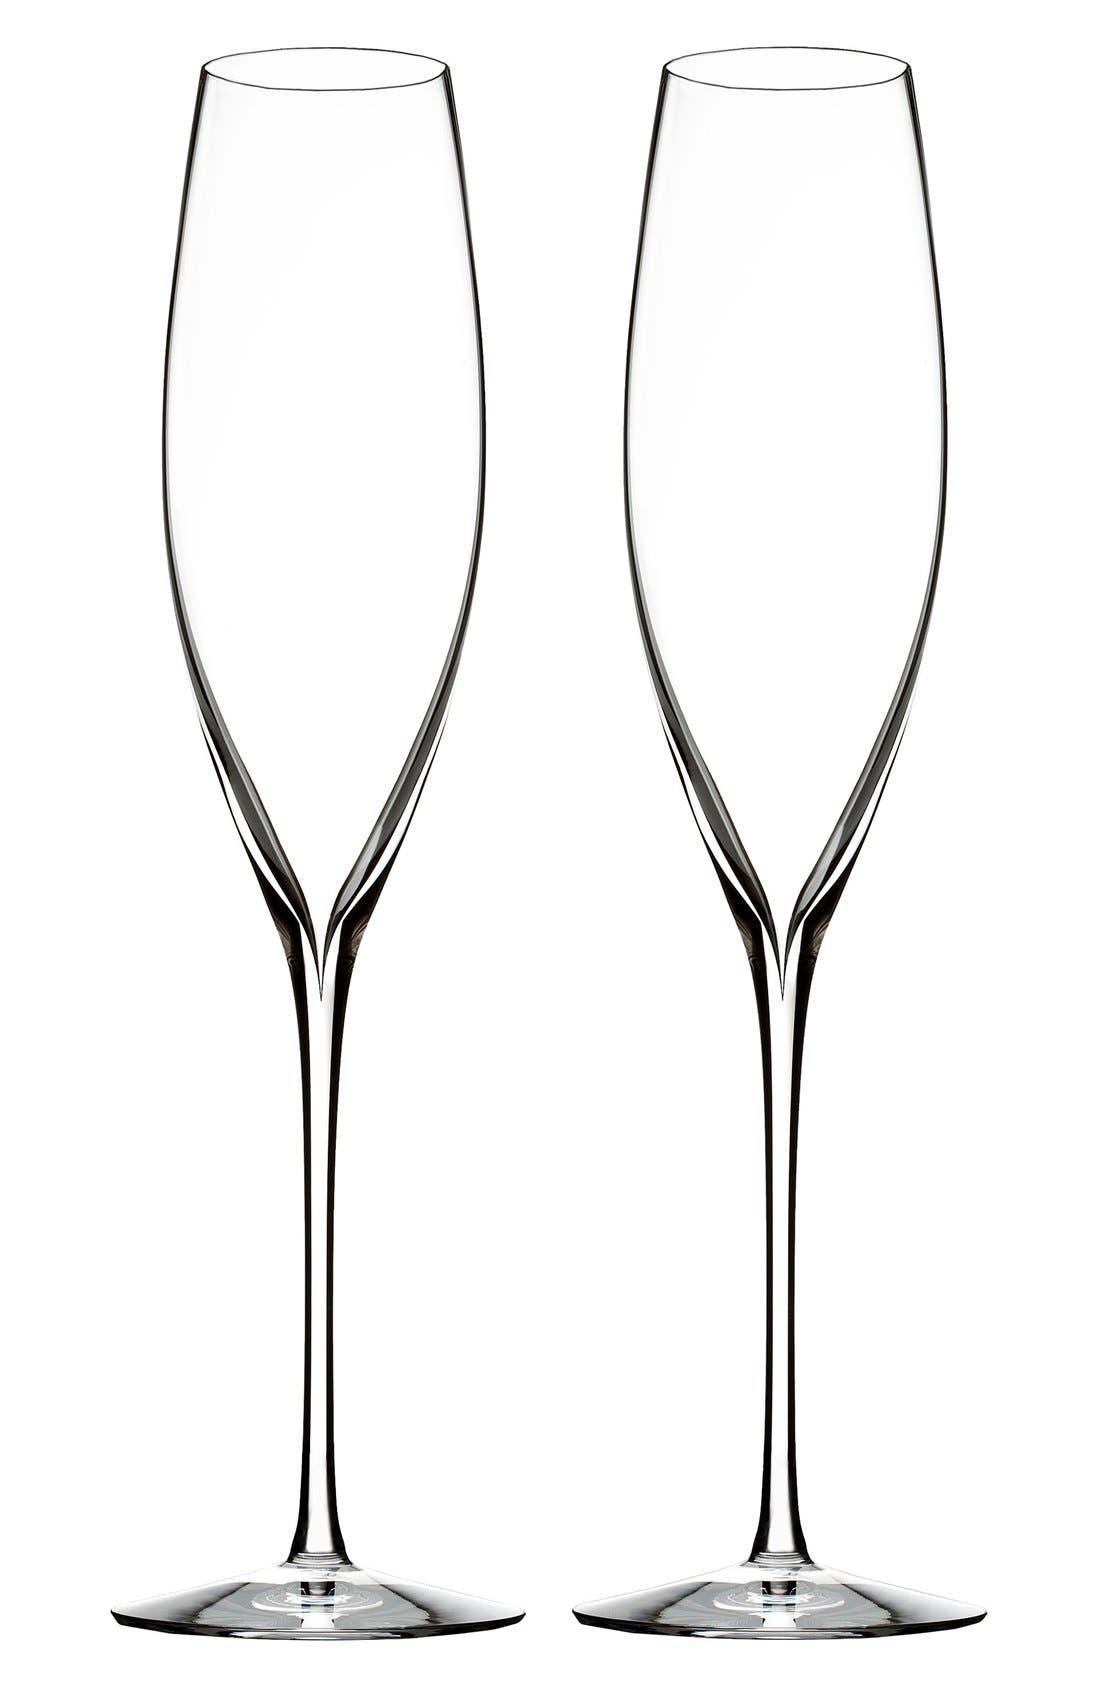 Main Image - Waterford 'Elegance' Fine Crystal Champagne Flutes (Set of 2)